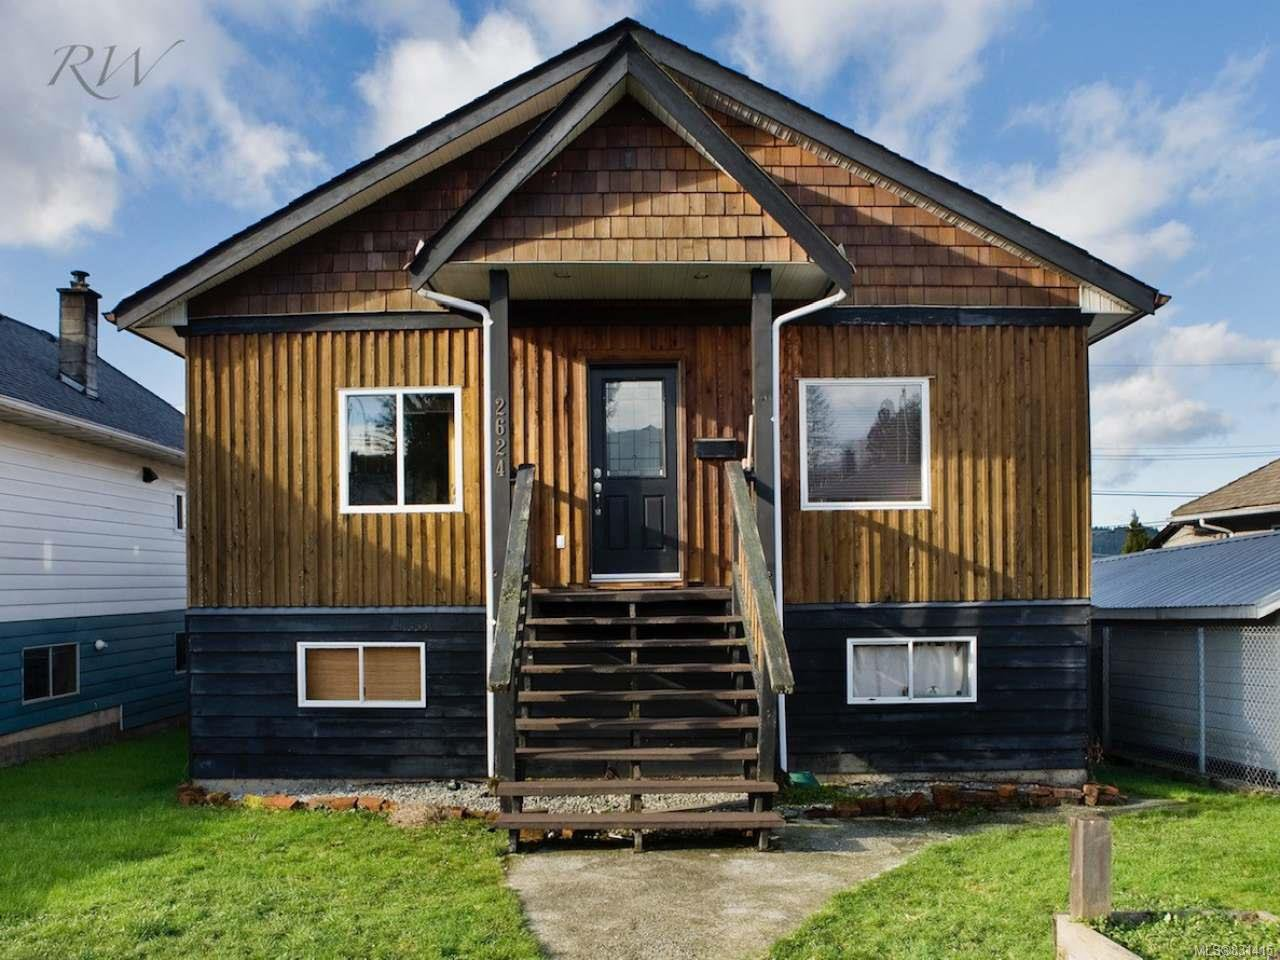 Main Photo: 2624 5th Ave in PORT ALBERNI: PA Port Alberni House for sale (Port Alberni)  : MLS®# 831415